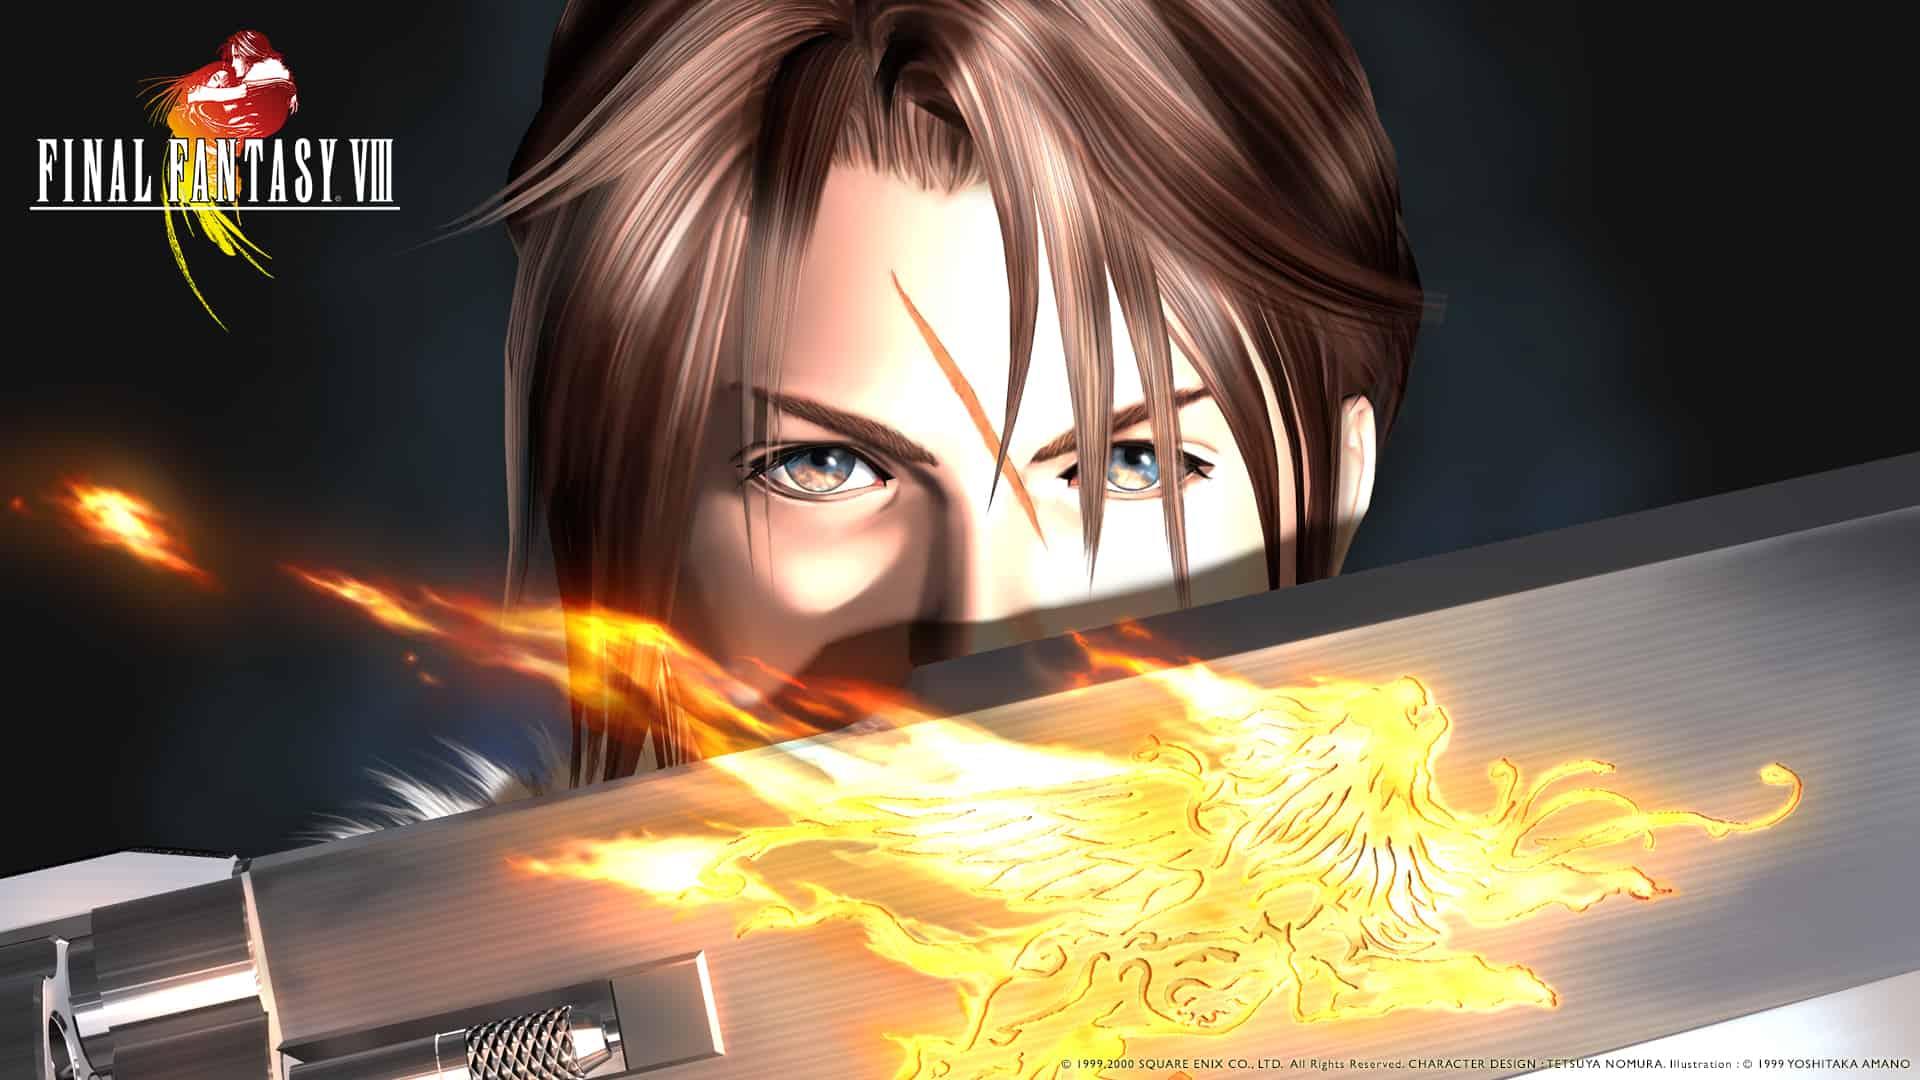 Final Fantasy VIII Squall